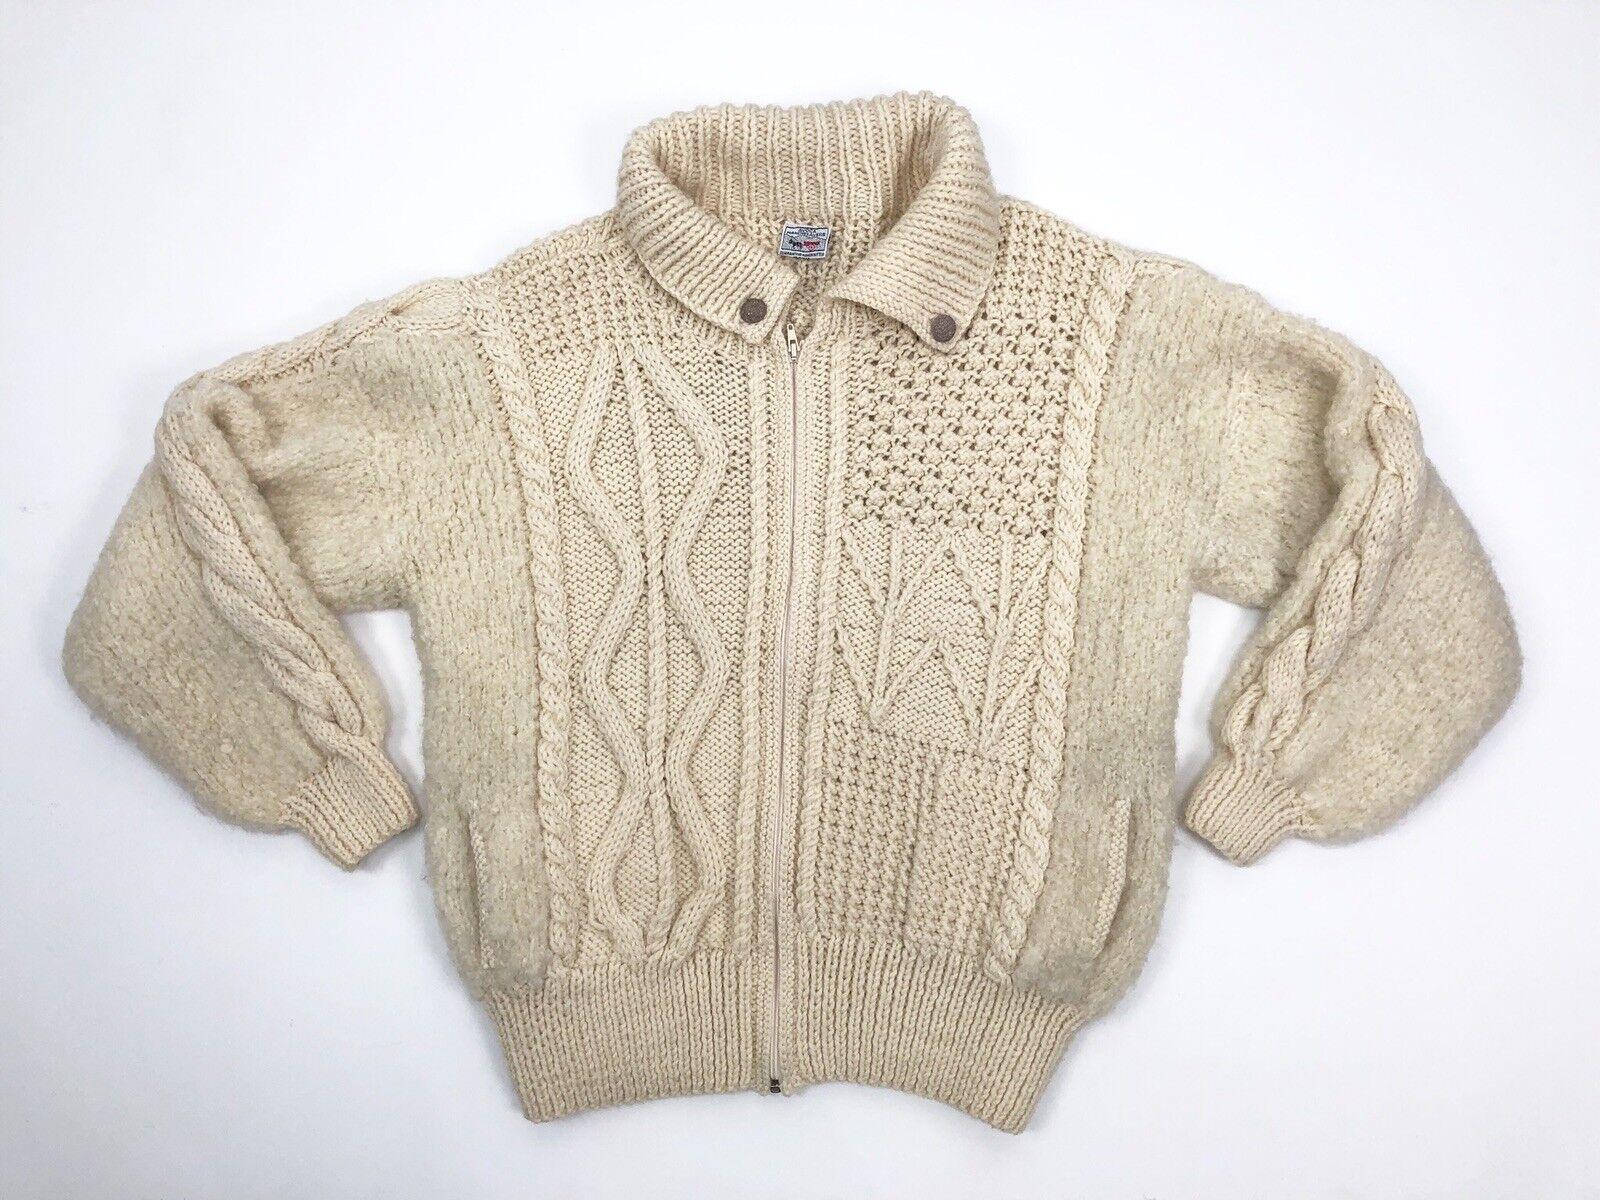 Avoca Ireland Wool Cable Knit Fisherman Full Zip  Sweater Cream Unisex Size M